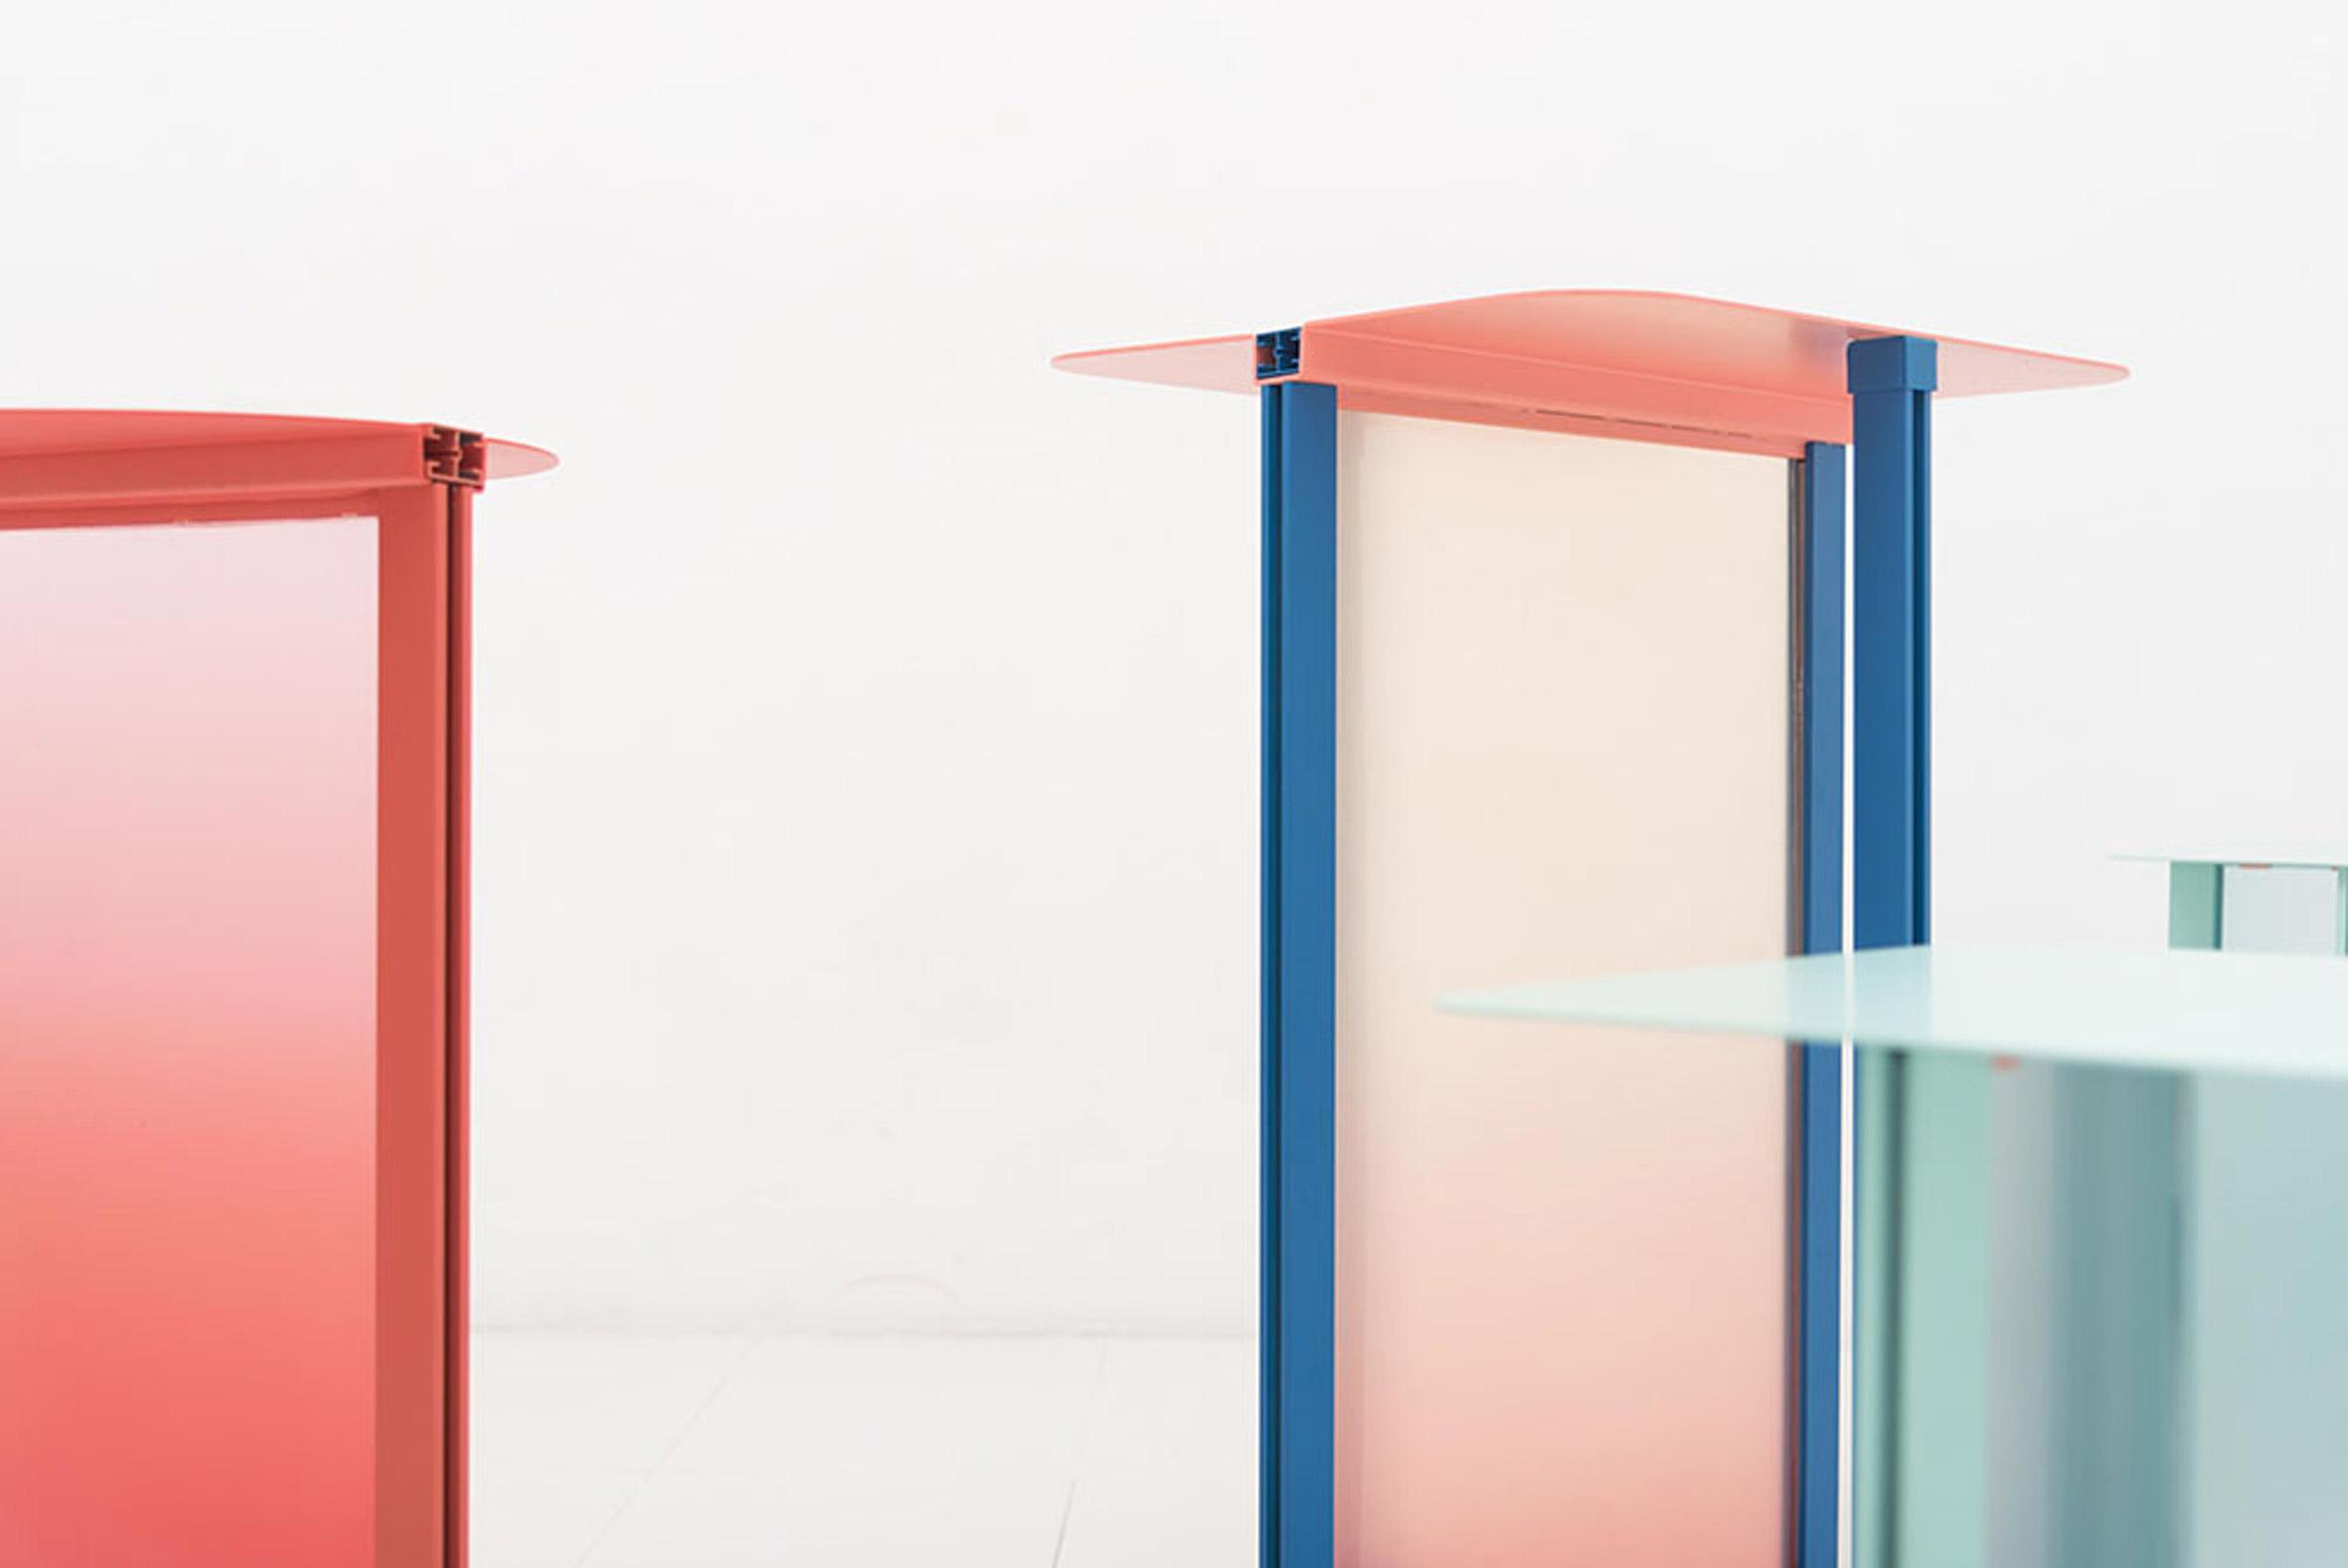 Femme Atelier reimagines the doorframe as items of furniture